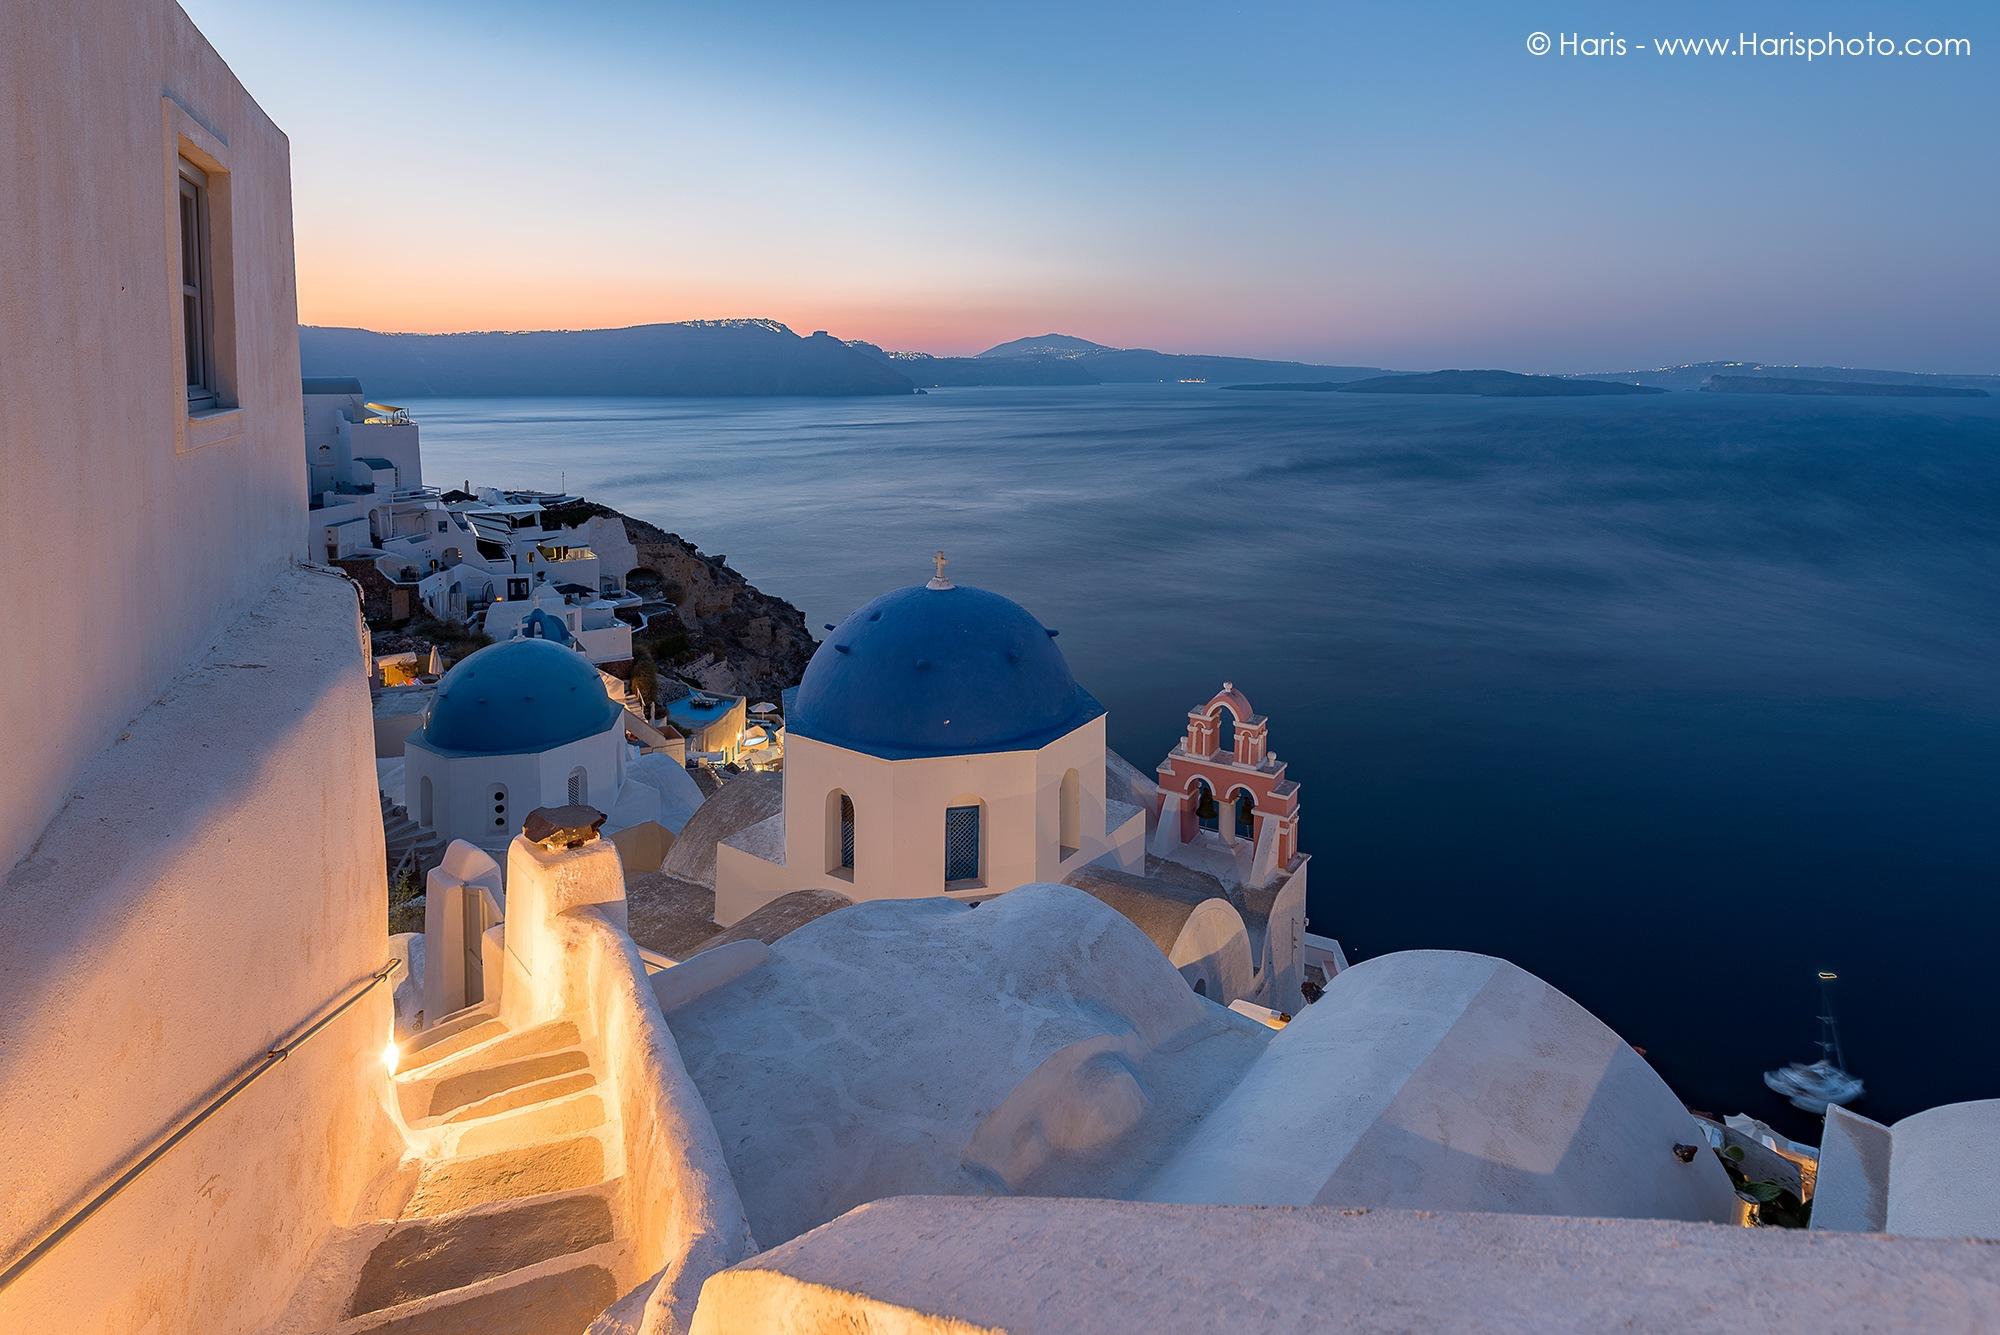 Sunrise at Oia , Santorini by Haris Vithoulkas